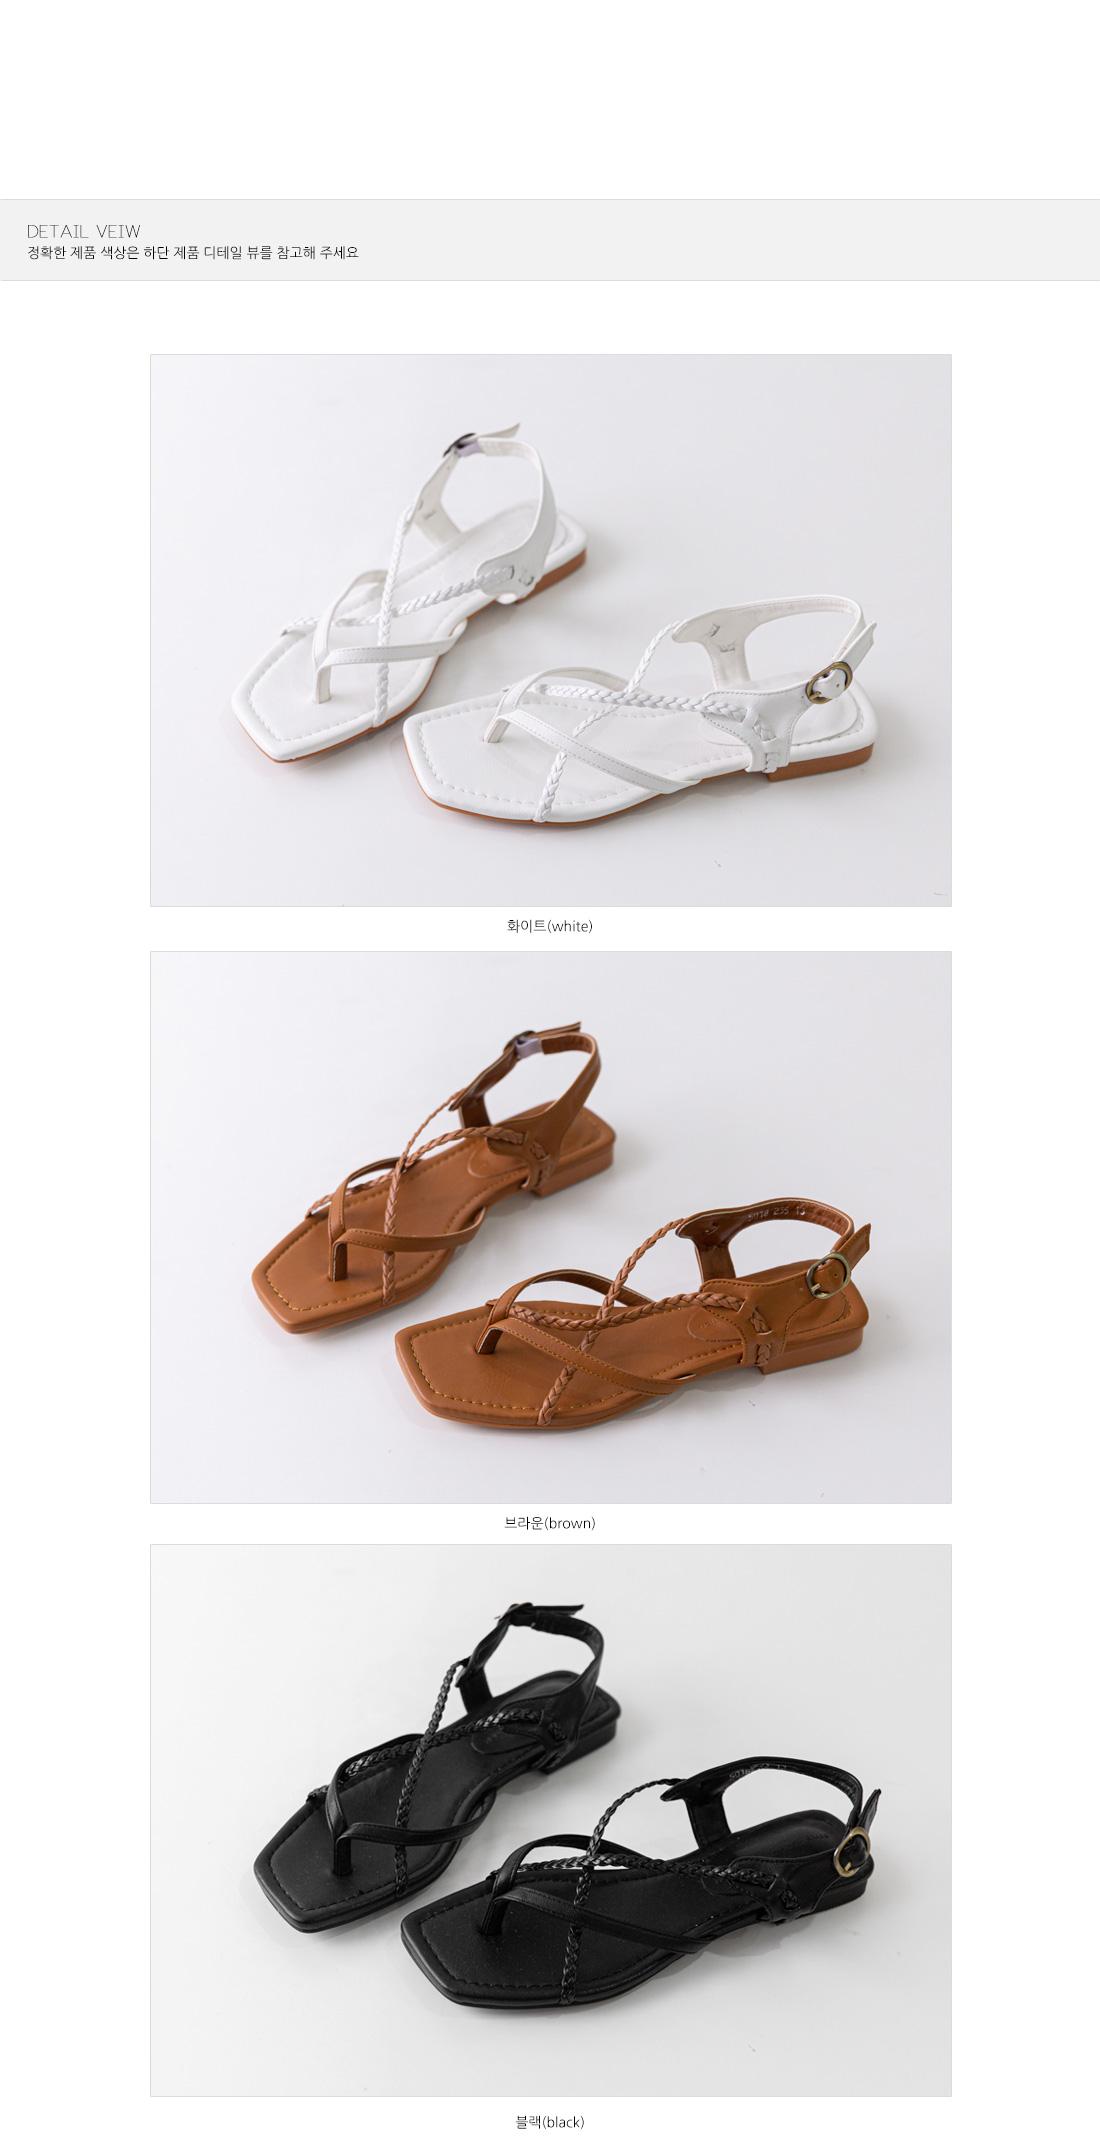 Cross strap sandals #86175